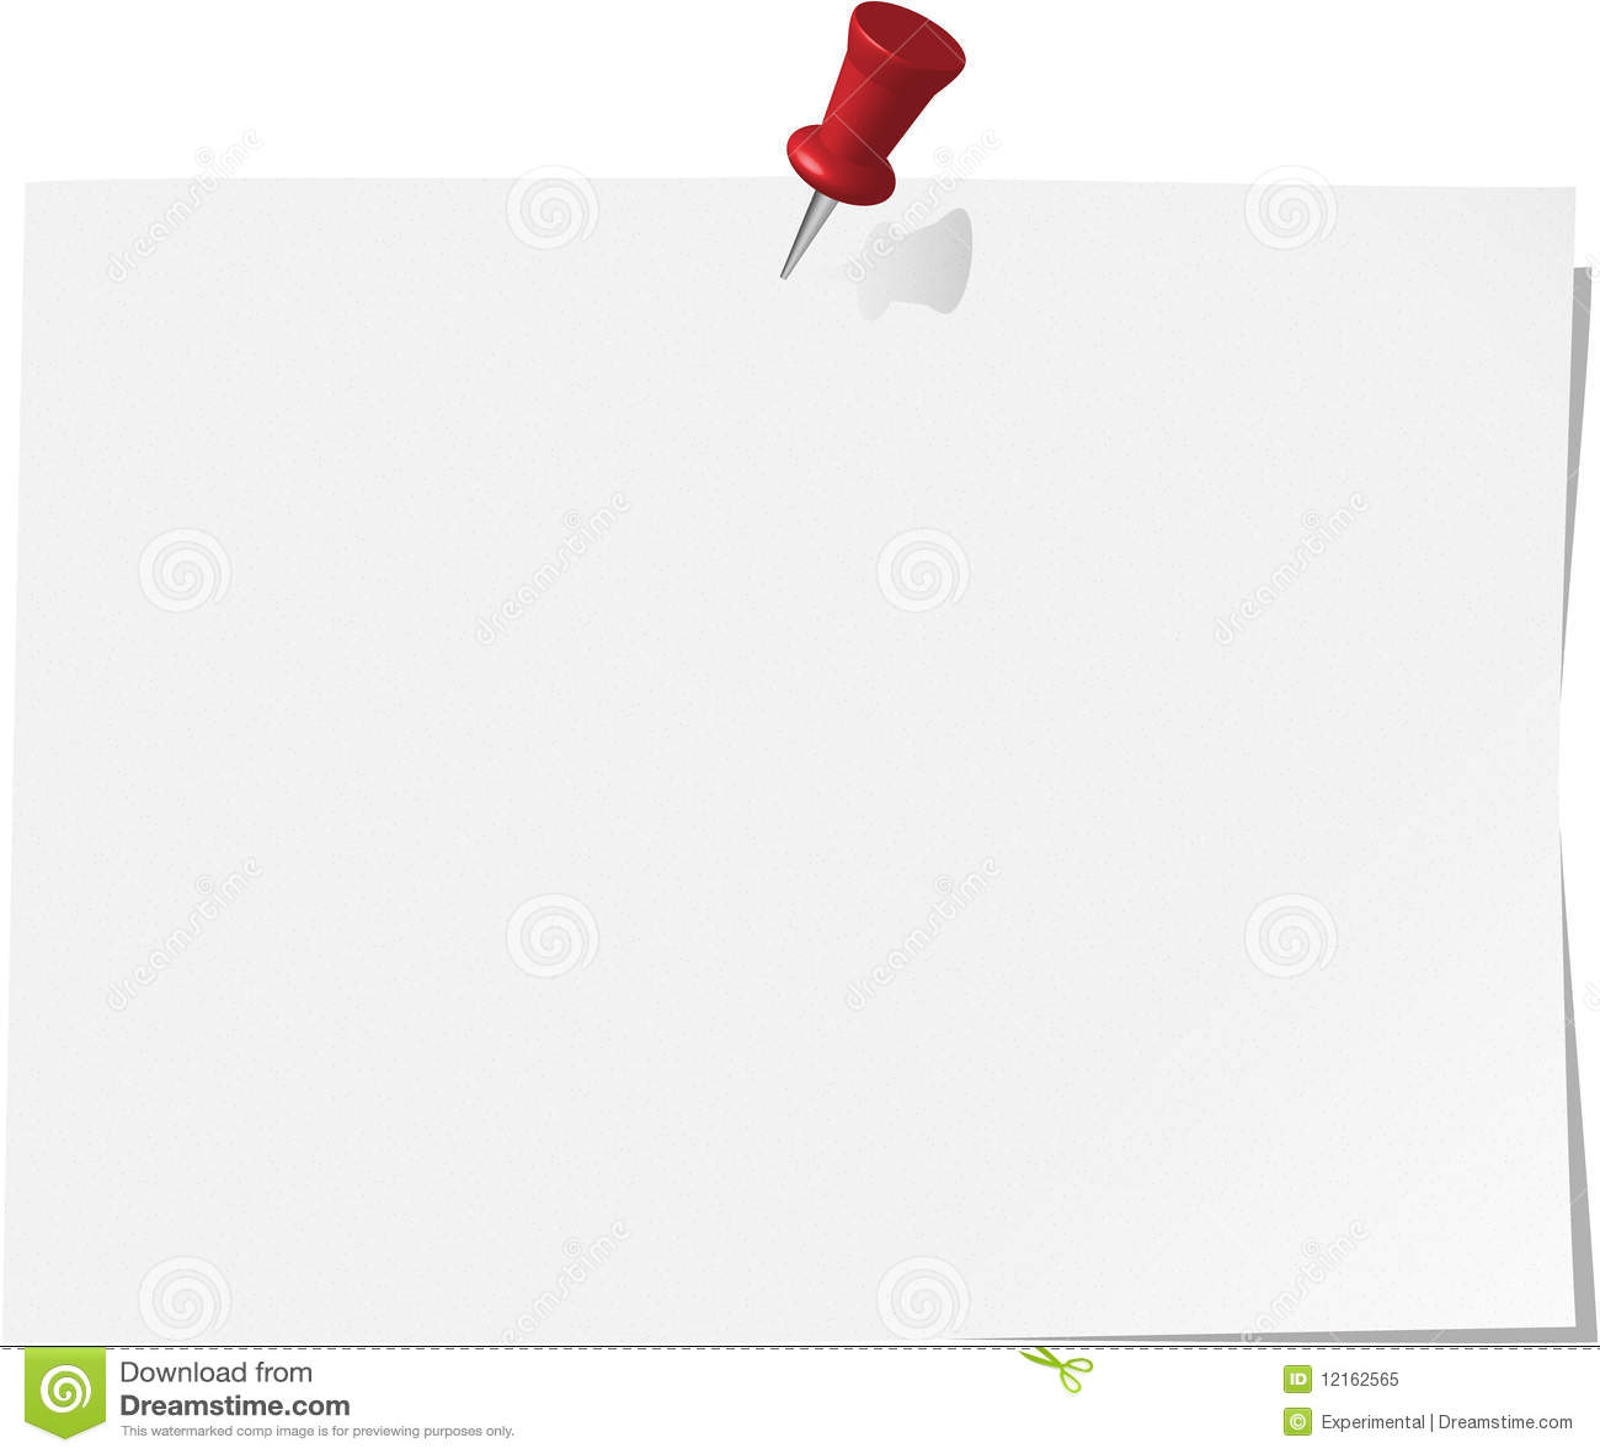 pinned note paper, white stock illustration. illustration of vector